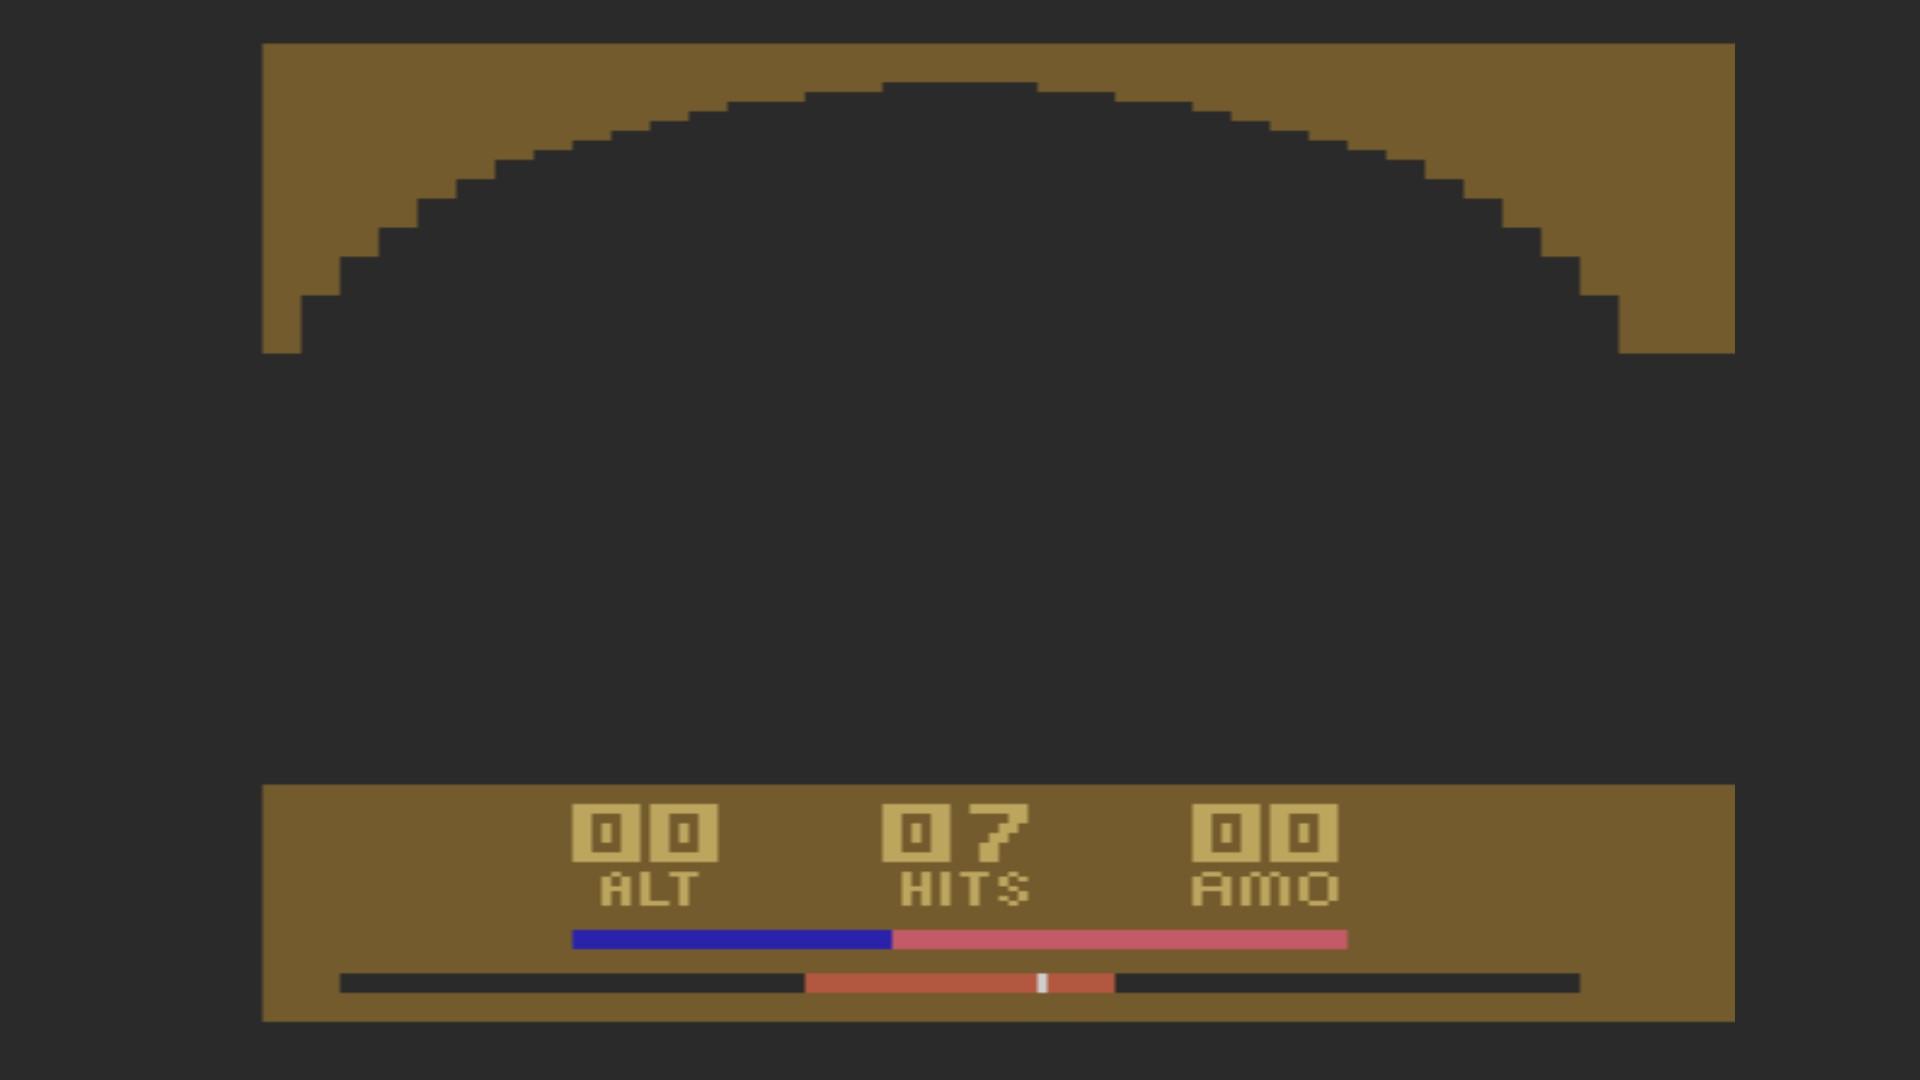 AkinNahtanoj: Air Raiders (Atari 2600 Emulated Novice/B Mode) 7 points on 2020-10-11 12:58:28